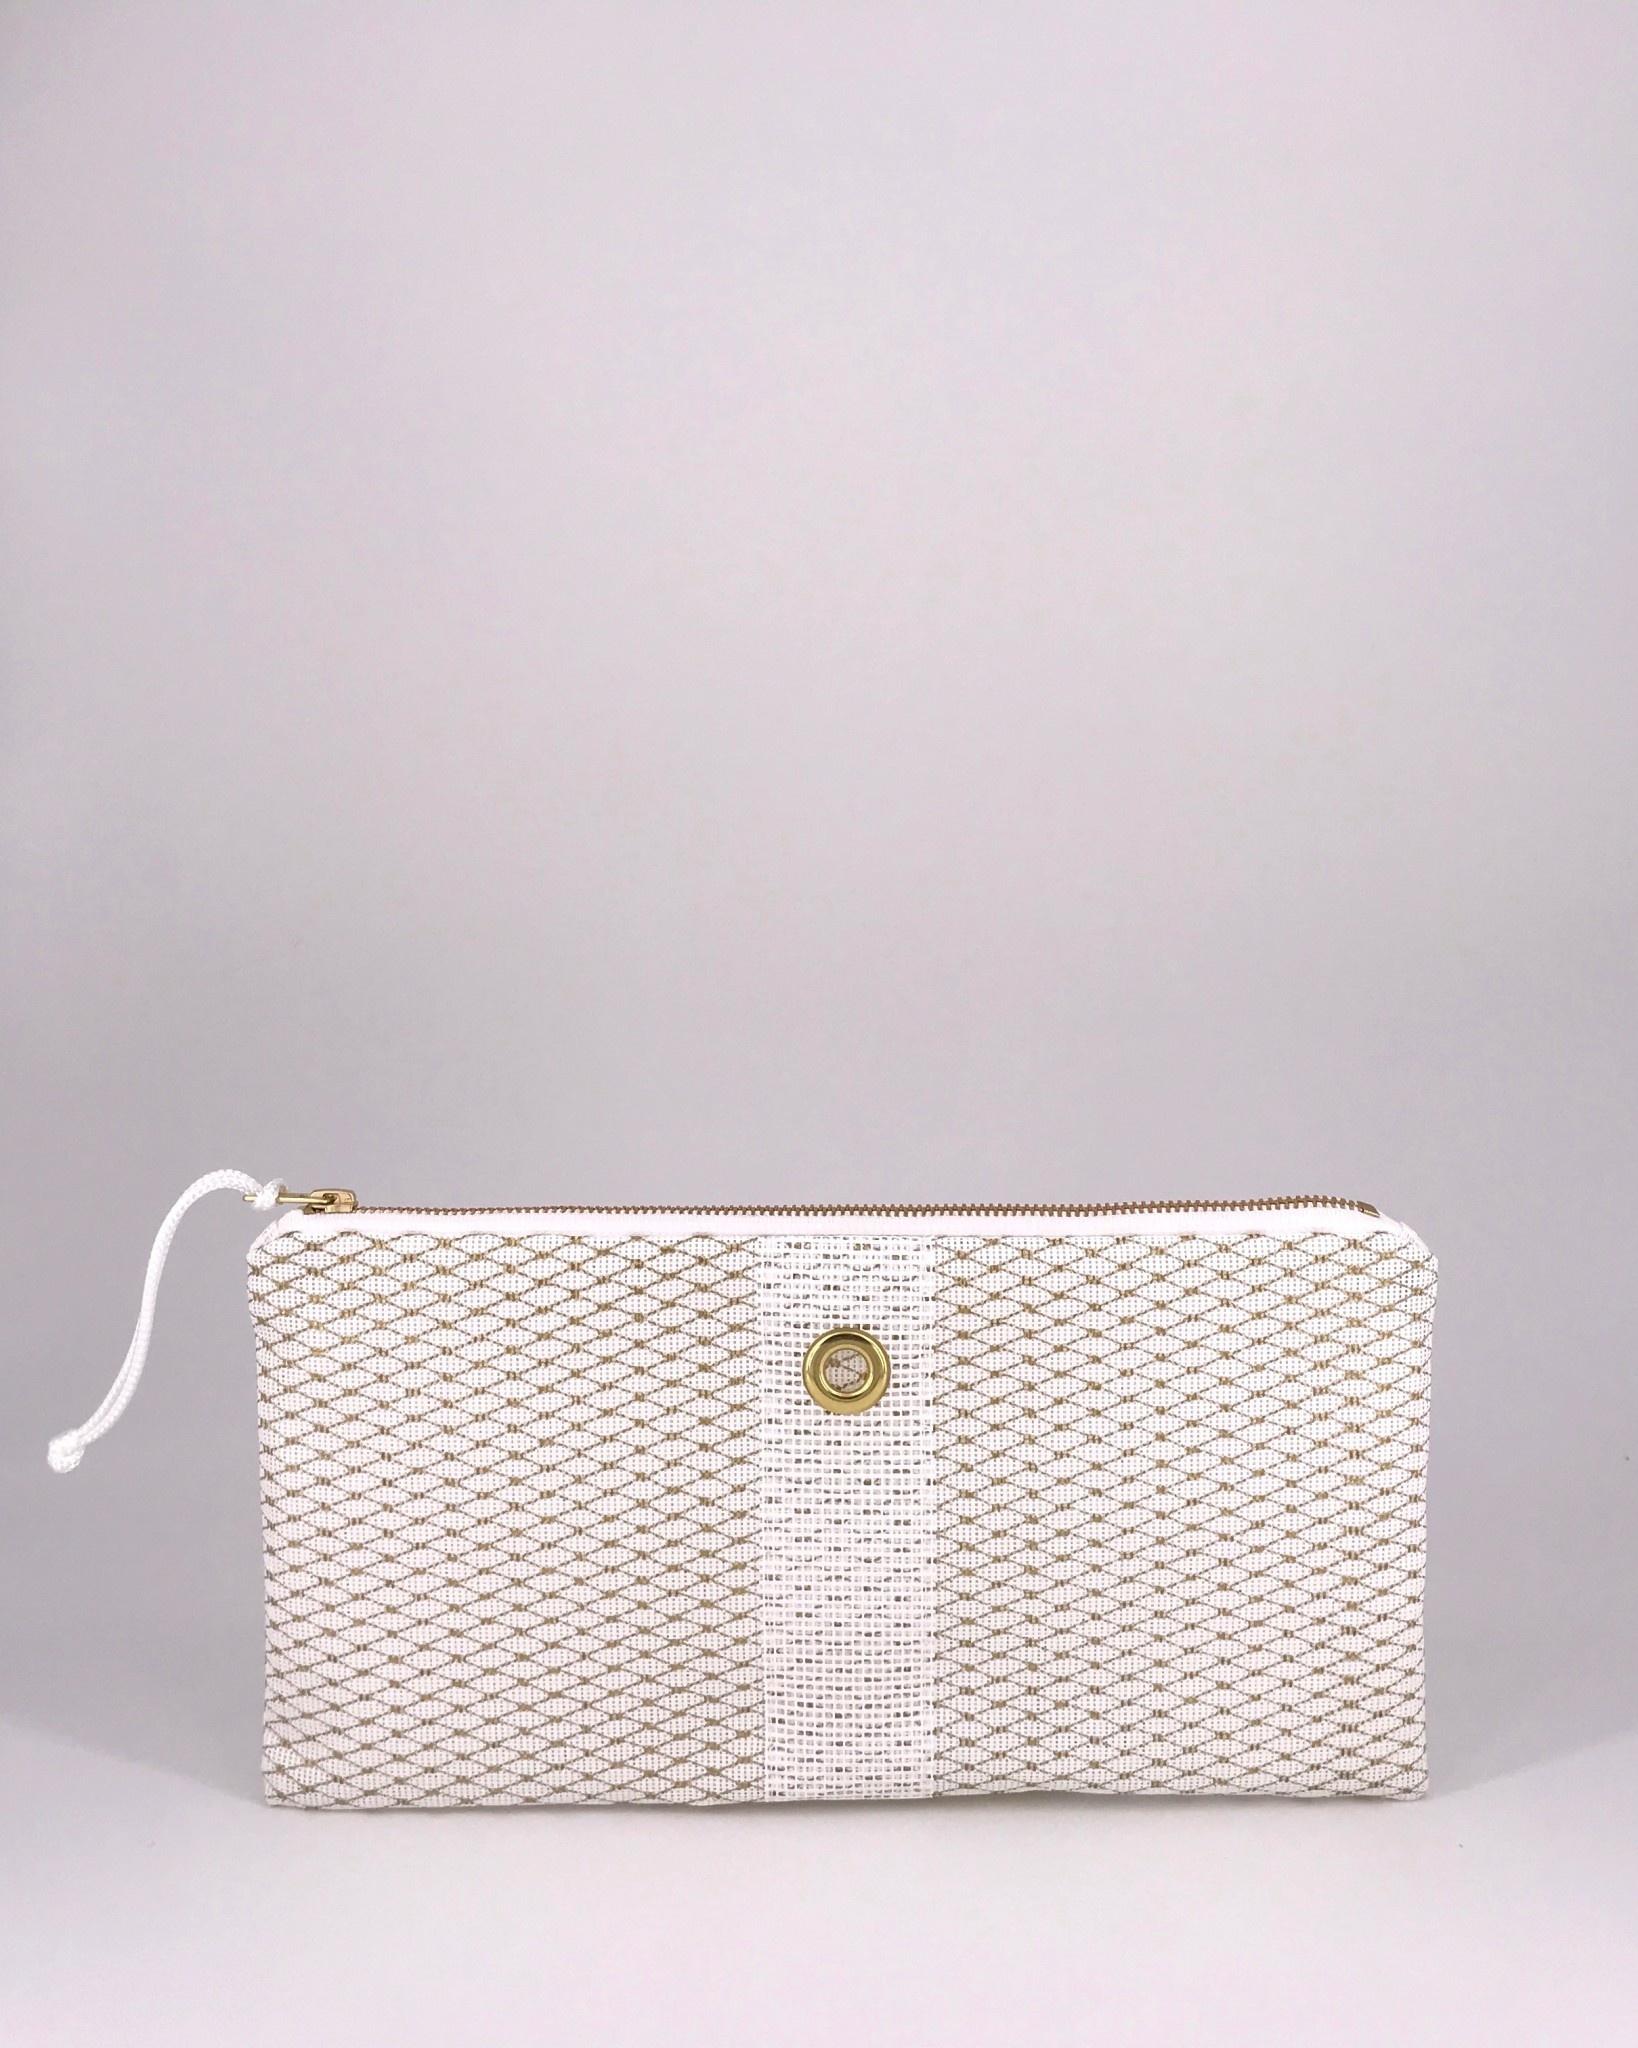 Alaina Marie ® Mini Gold on White & White Clutch